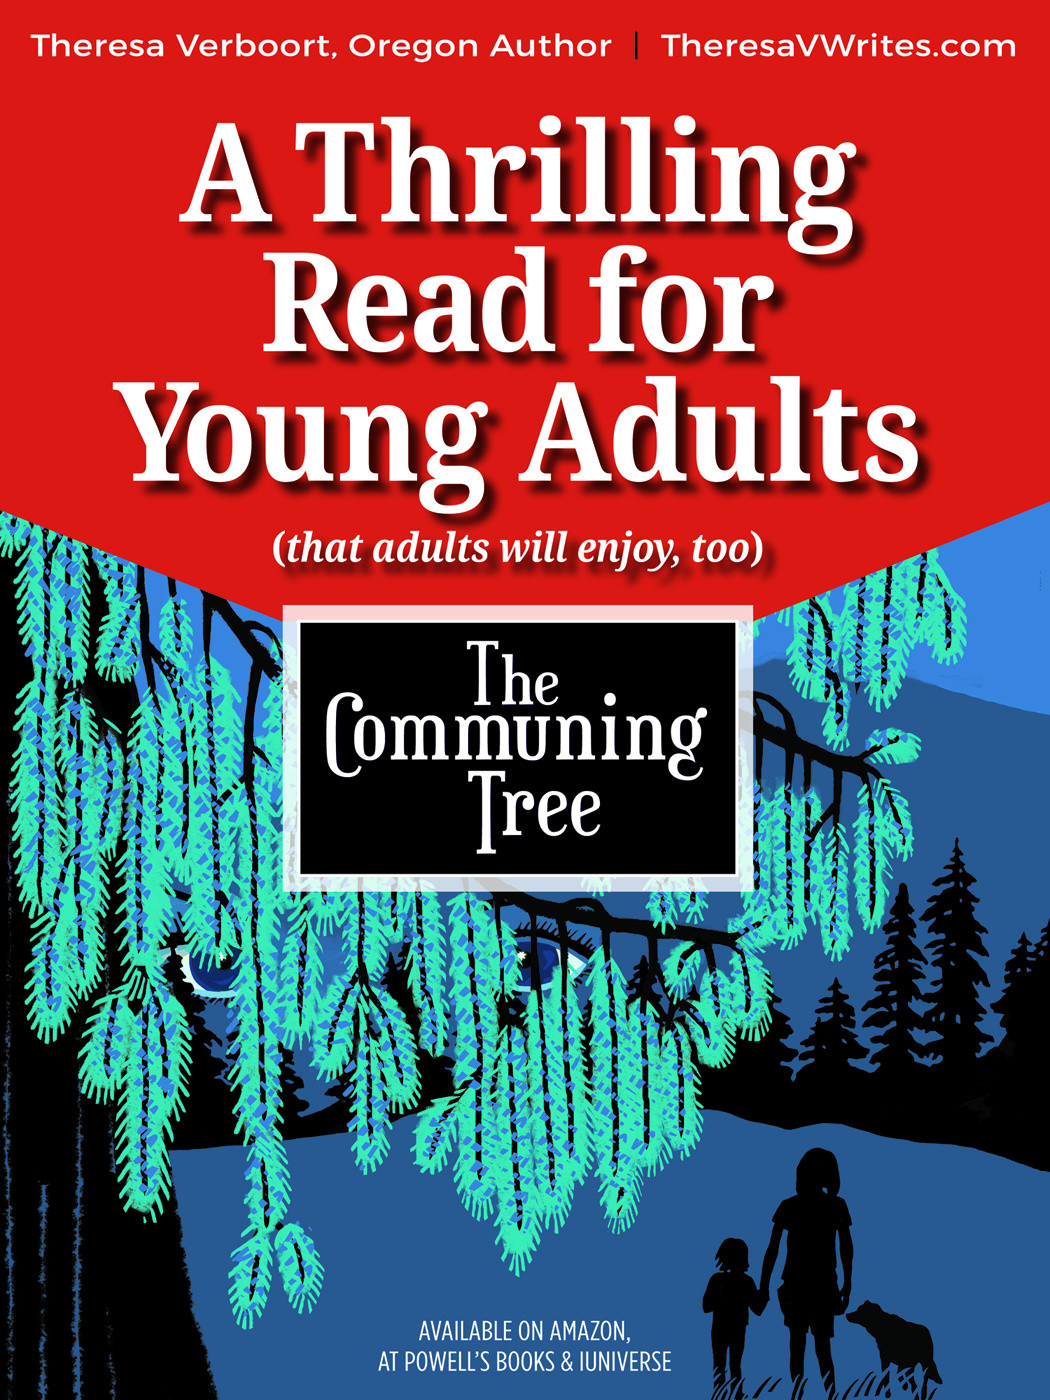 TheCommuningTree_Poster_3_CMYK.jpg